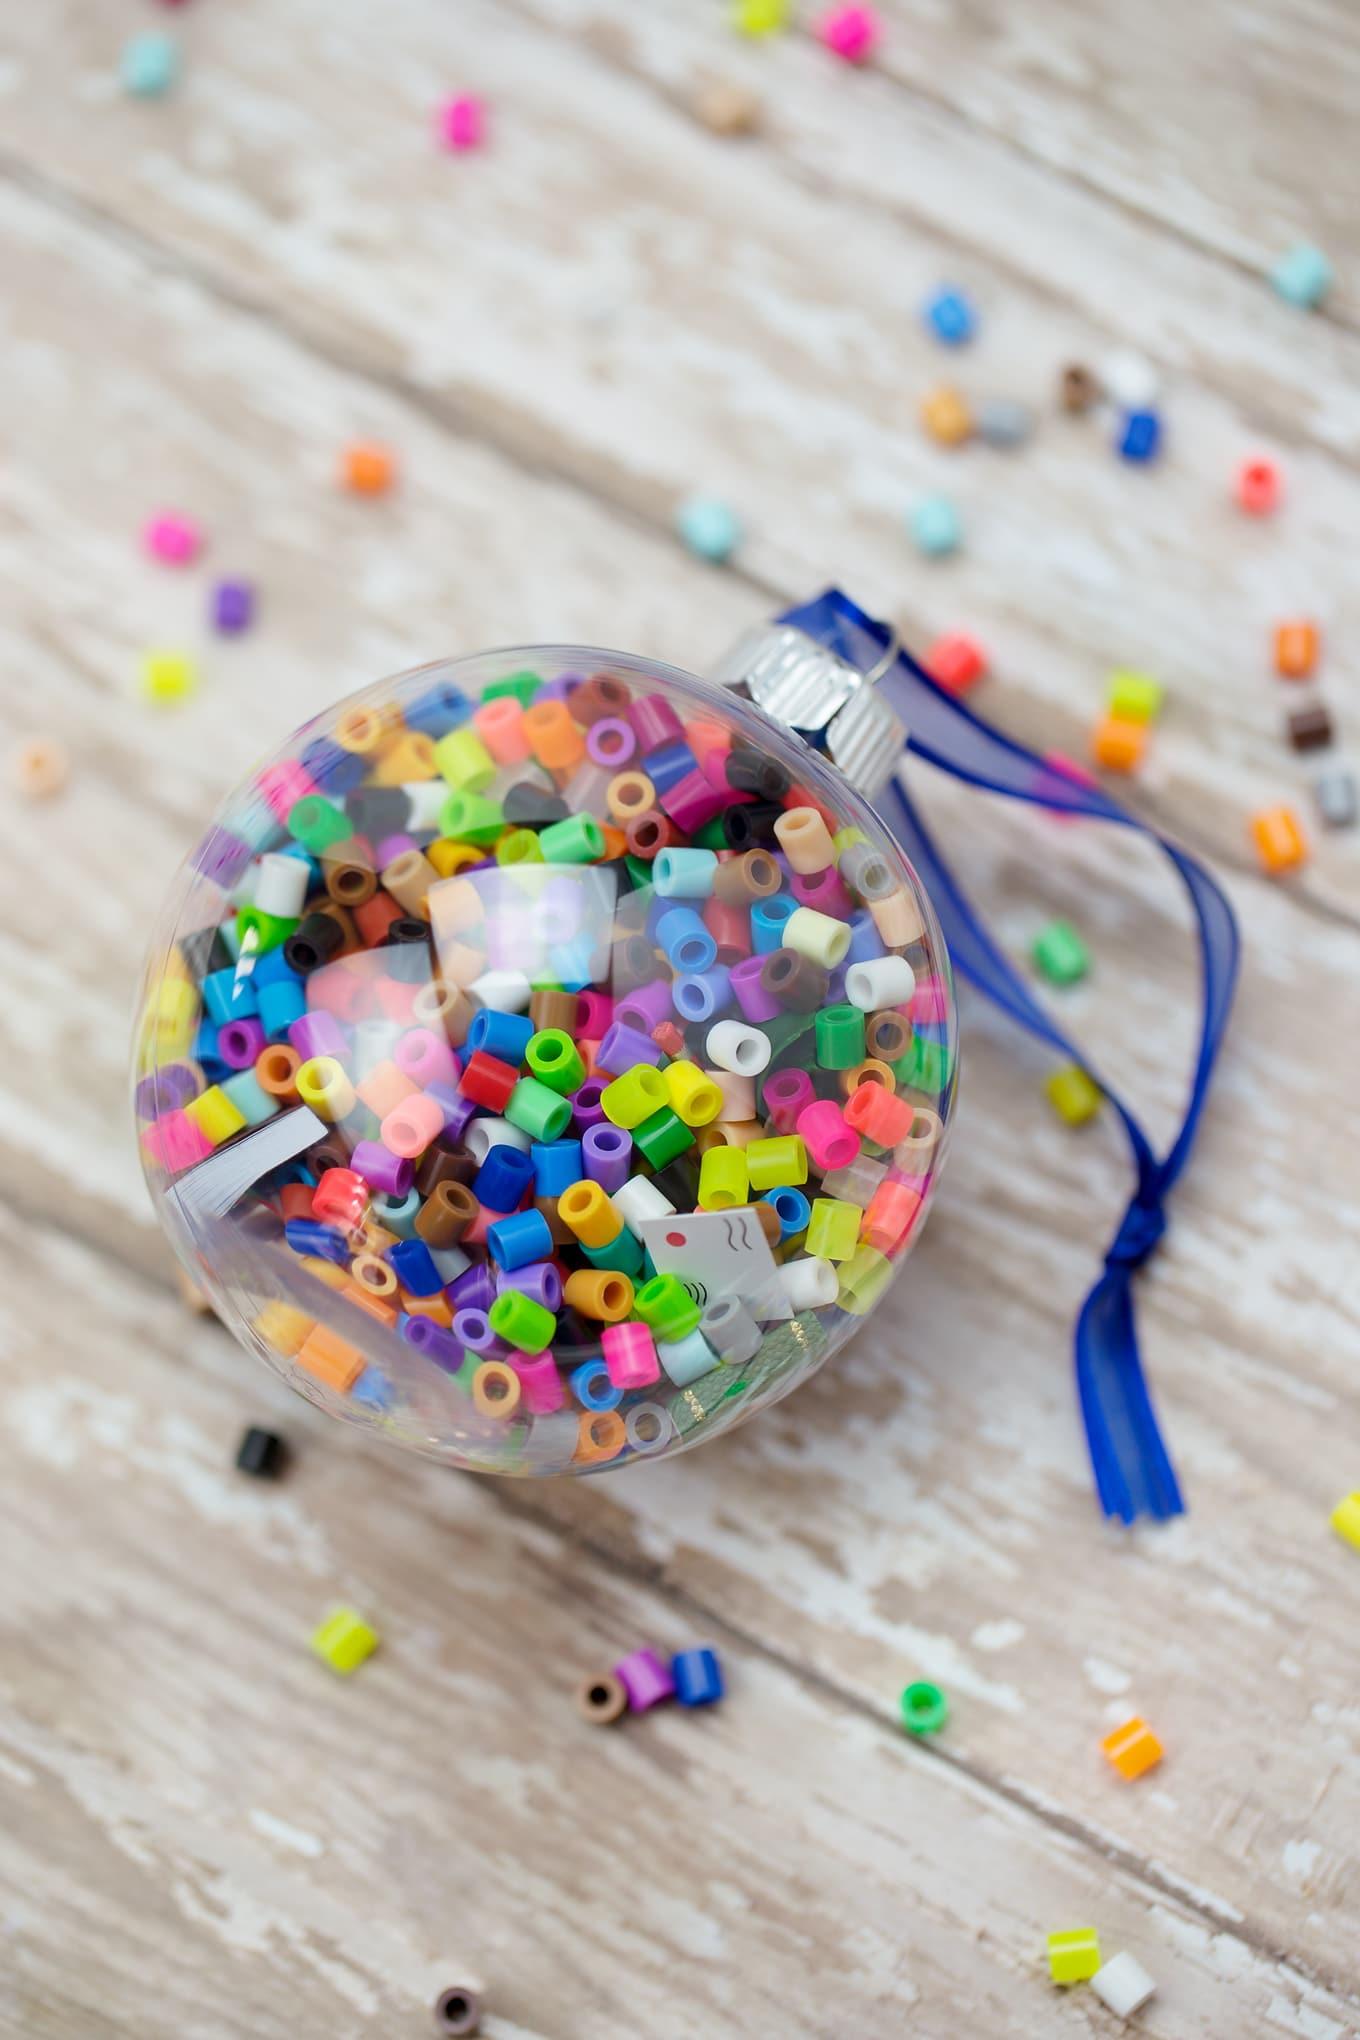 How to Make Colorful I Spy Christmas Ornaments